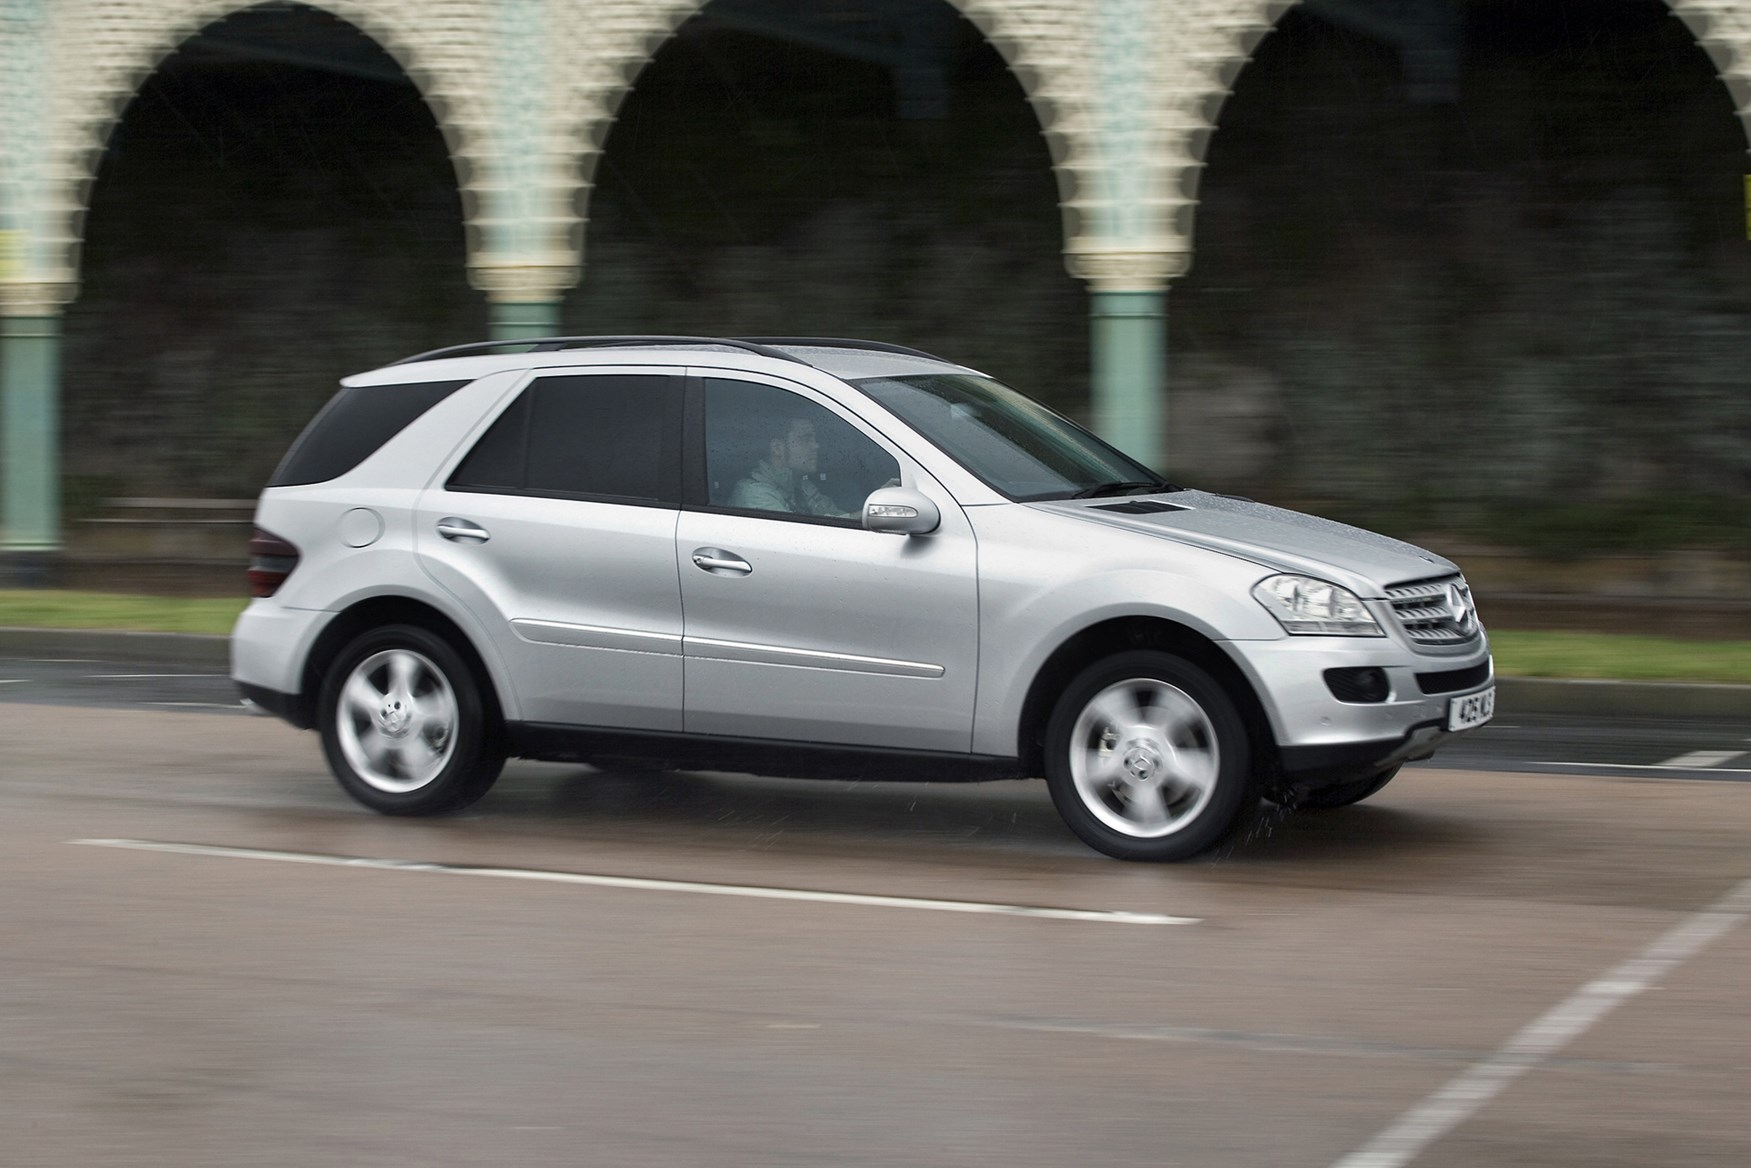 Mercedes benz m class hatchback 2005 2011 photos parkers for 2005 mercedes benz ml350 review